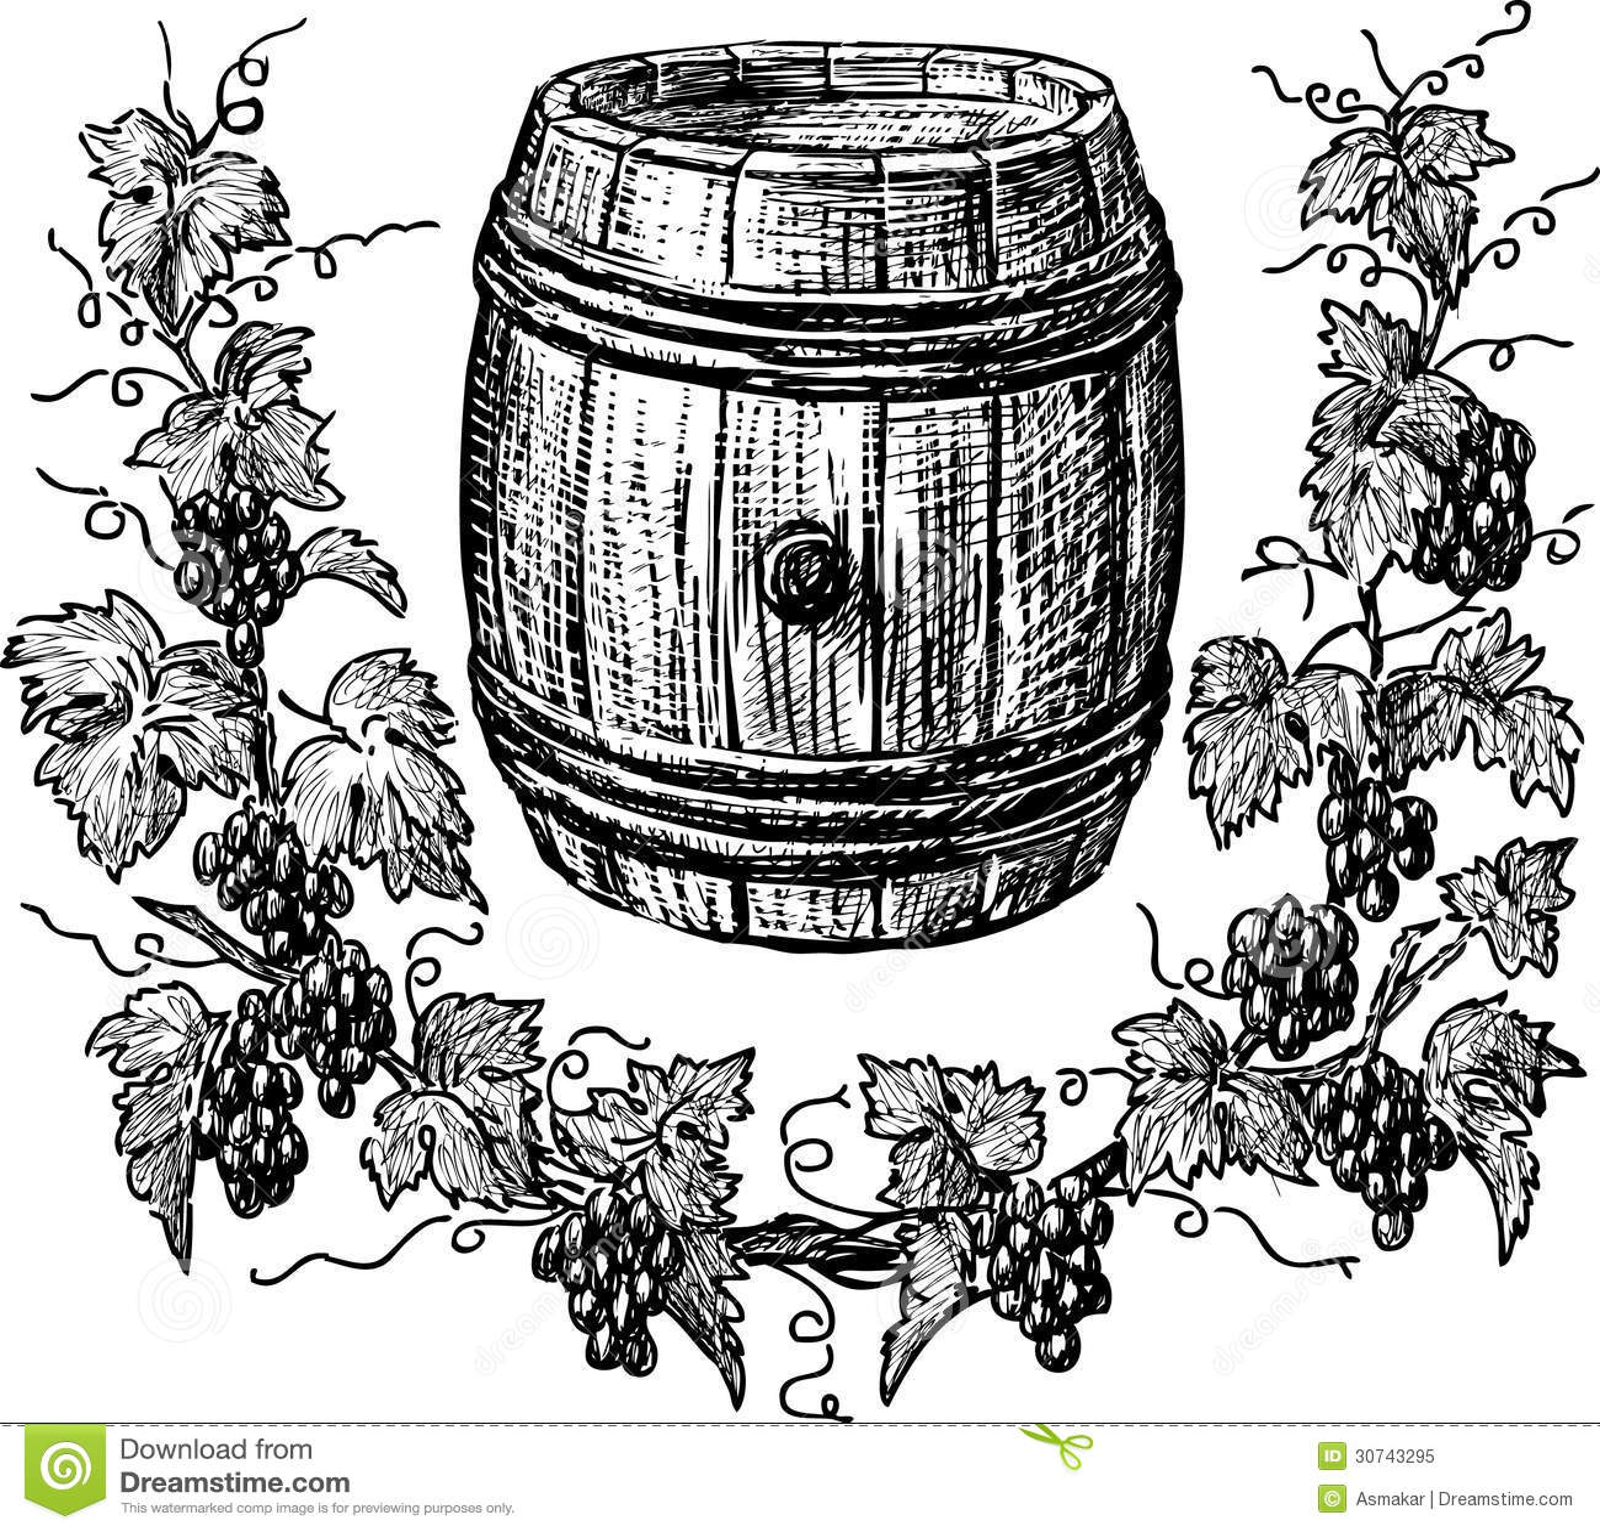 Wine cask and grapevine